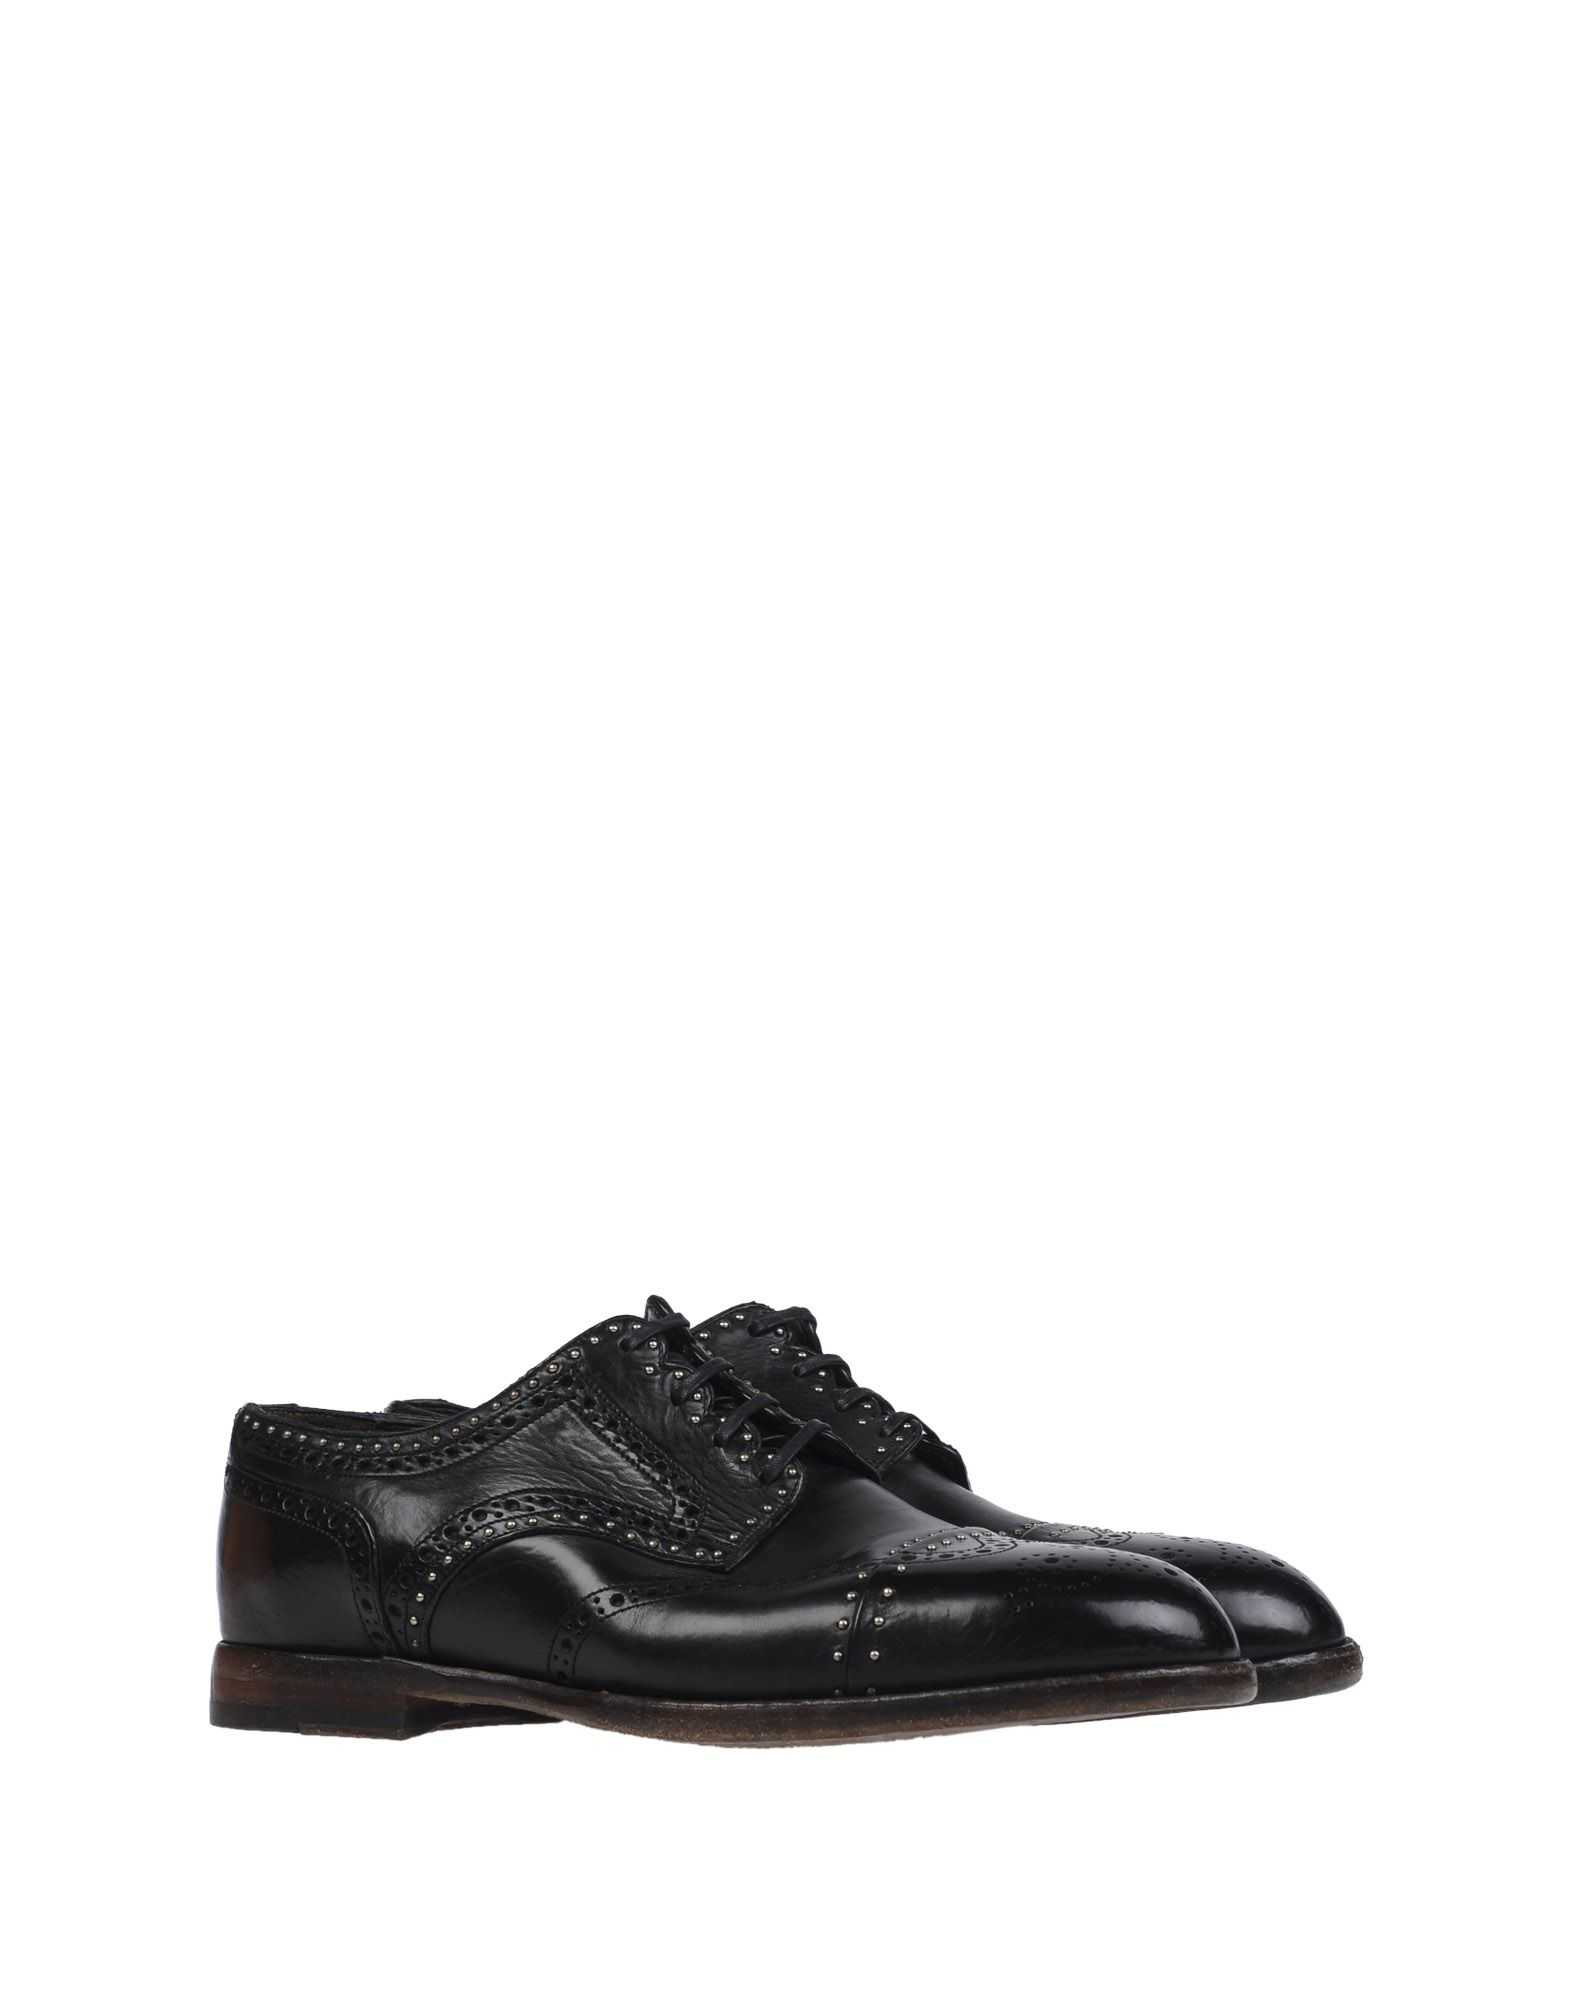 Dolce & Gute Gabbana Schnürschuhe Herren  11174062SA Gute & Qualität beliebte Schuhe 449996